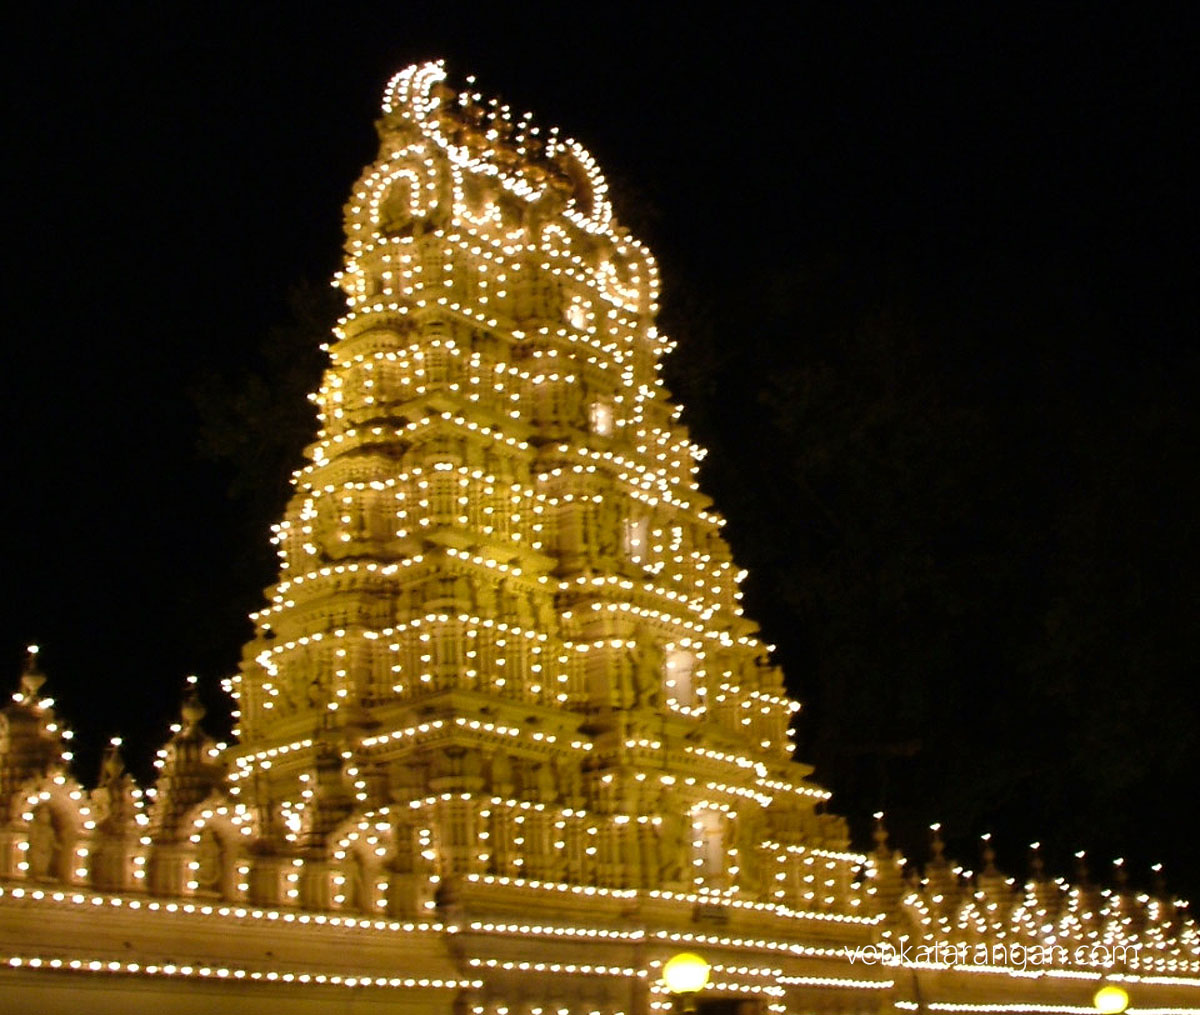 Sri Varaha Swamy temple inside the palace